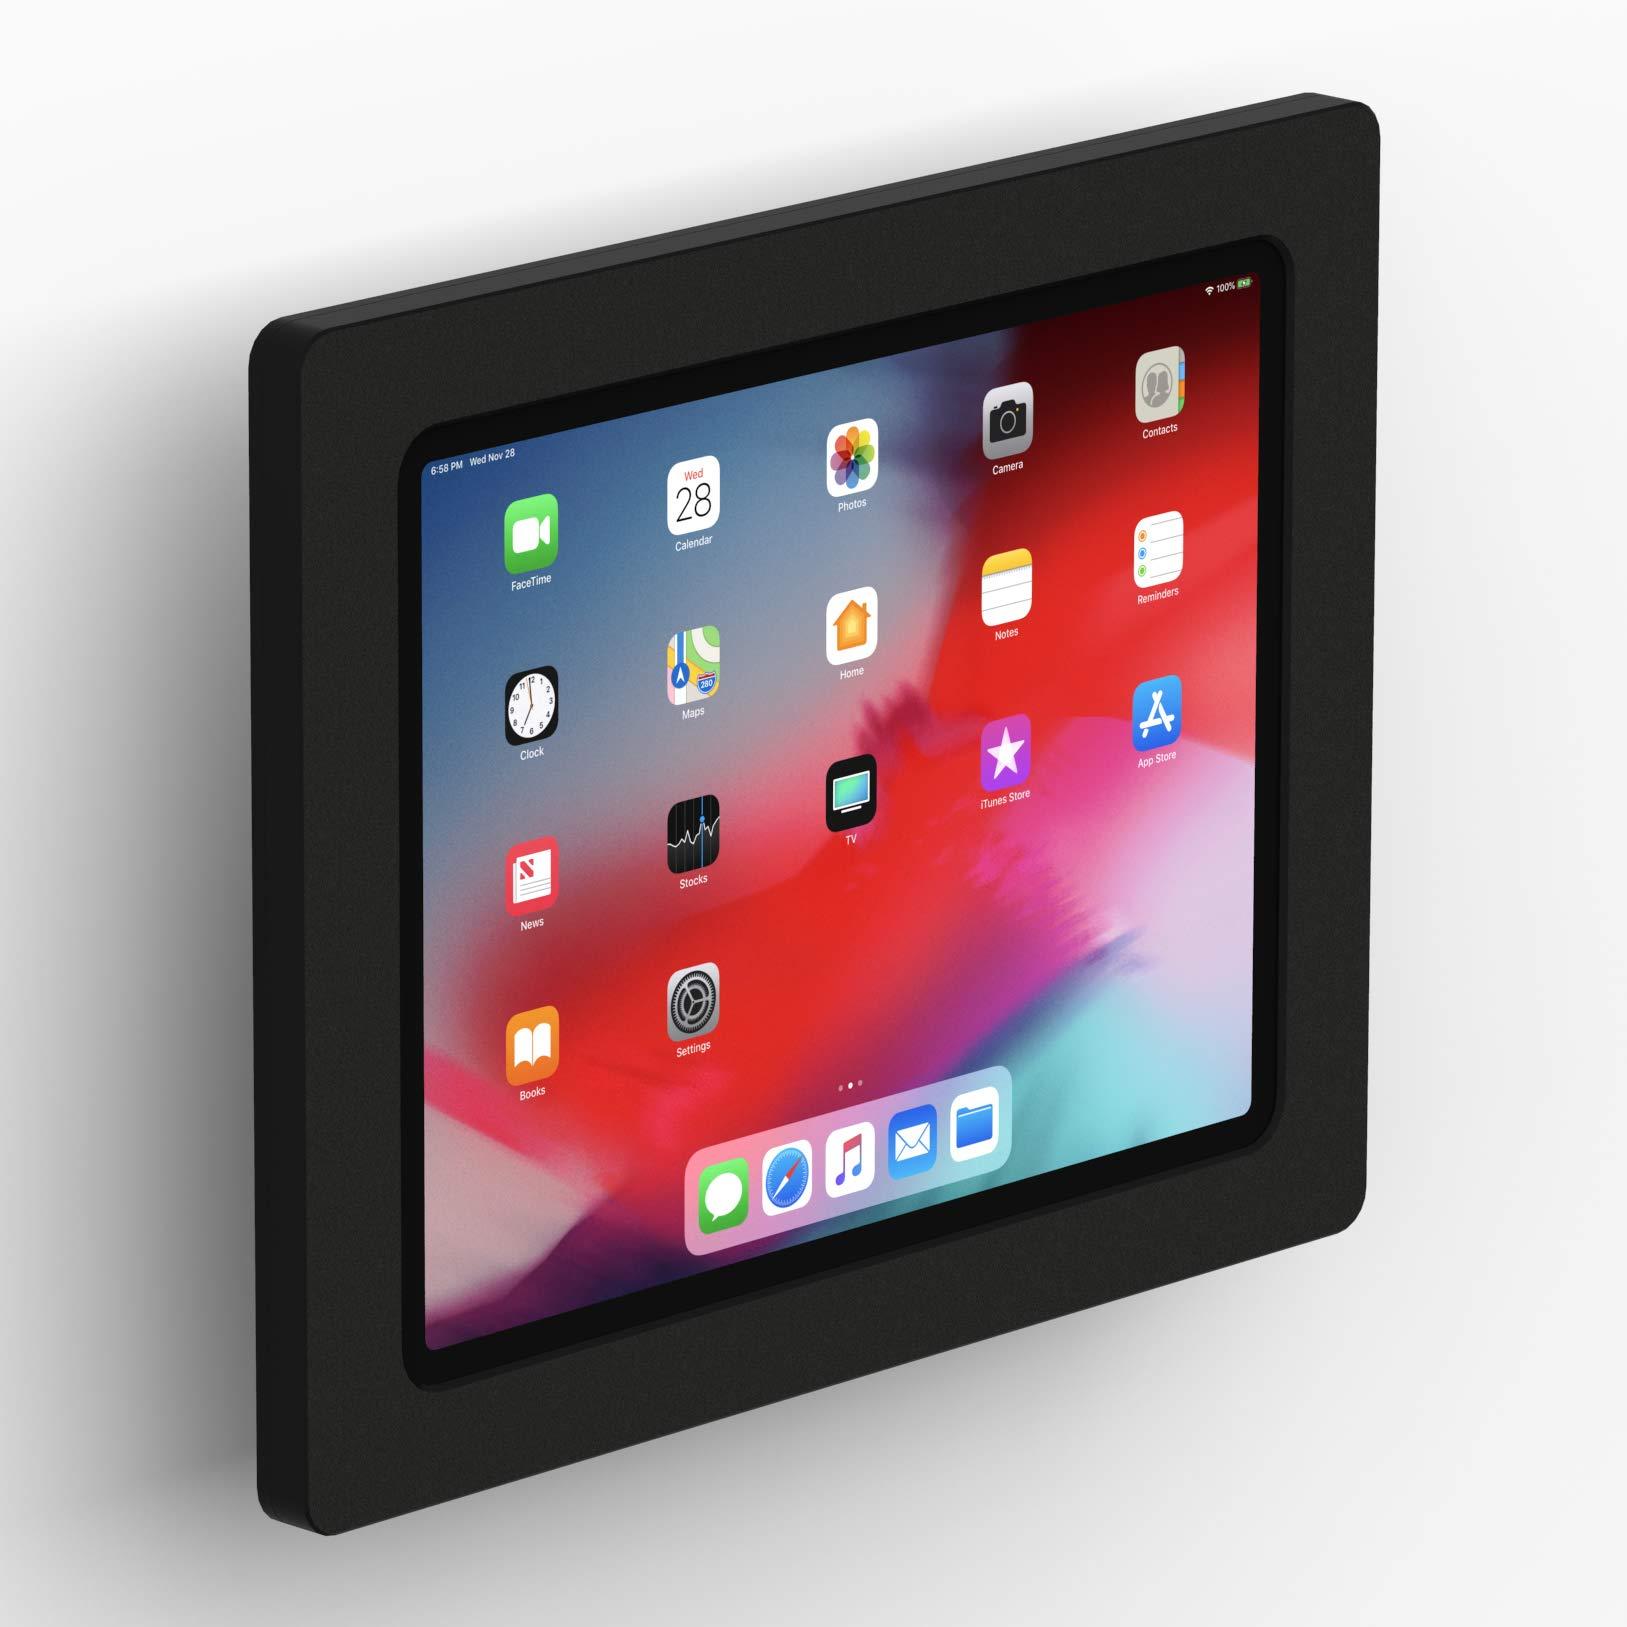 VidaMount Black Enclosure and Tilting VESA Slim Wall Mount [Bundle] Compatible with iPad Pro 12.9'' (3rd Gen) by VidaBox Kiosks (Image #1)